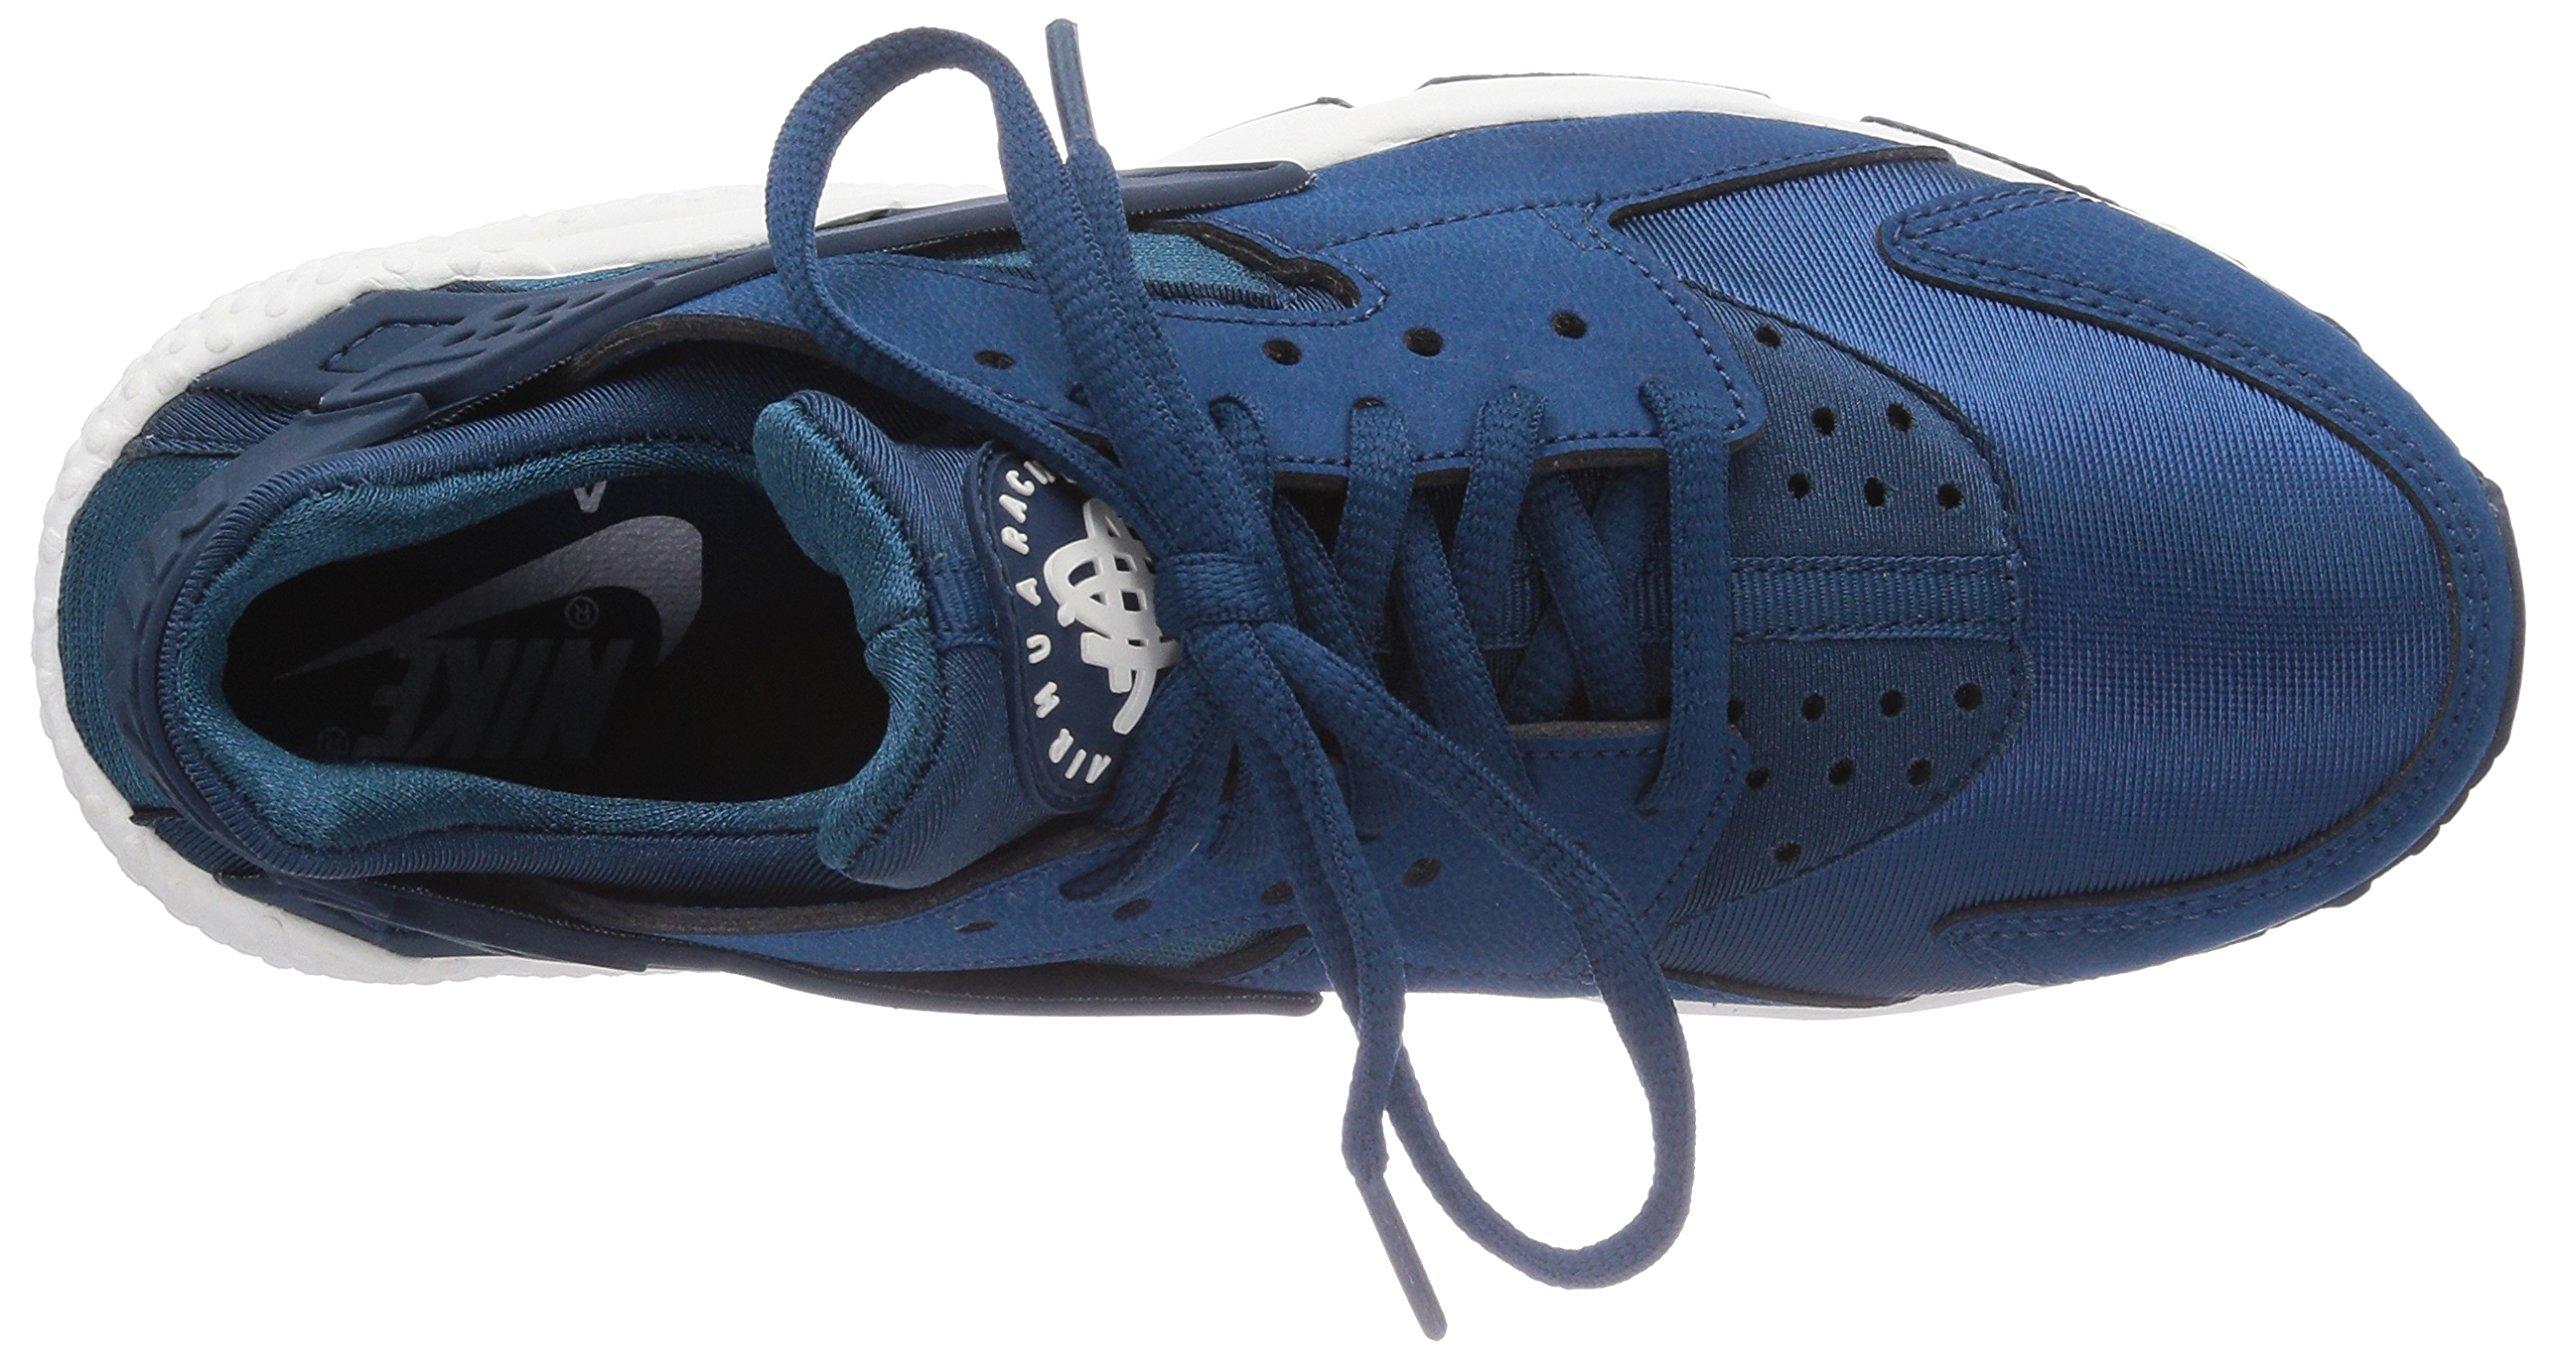 nike womens air huarache trainers 634835 sneakers shoes (UK 3 us 5.5 EU 36, blue force blue force sail 400) by NIKE (Image #7)